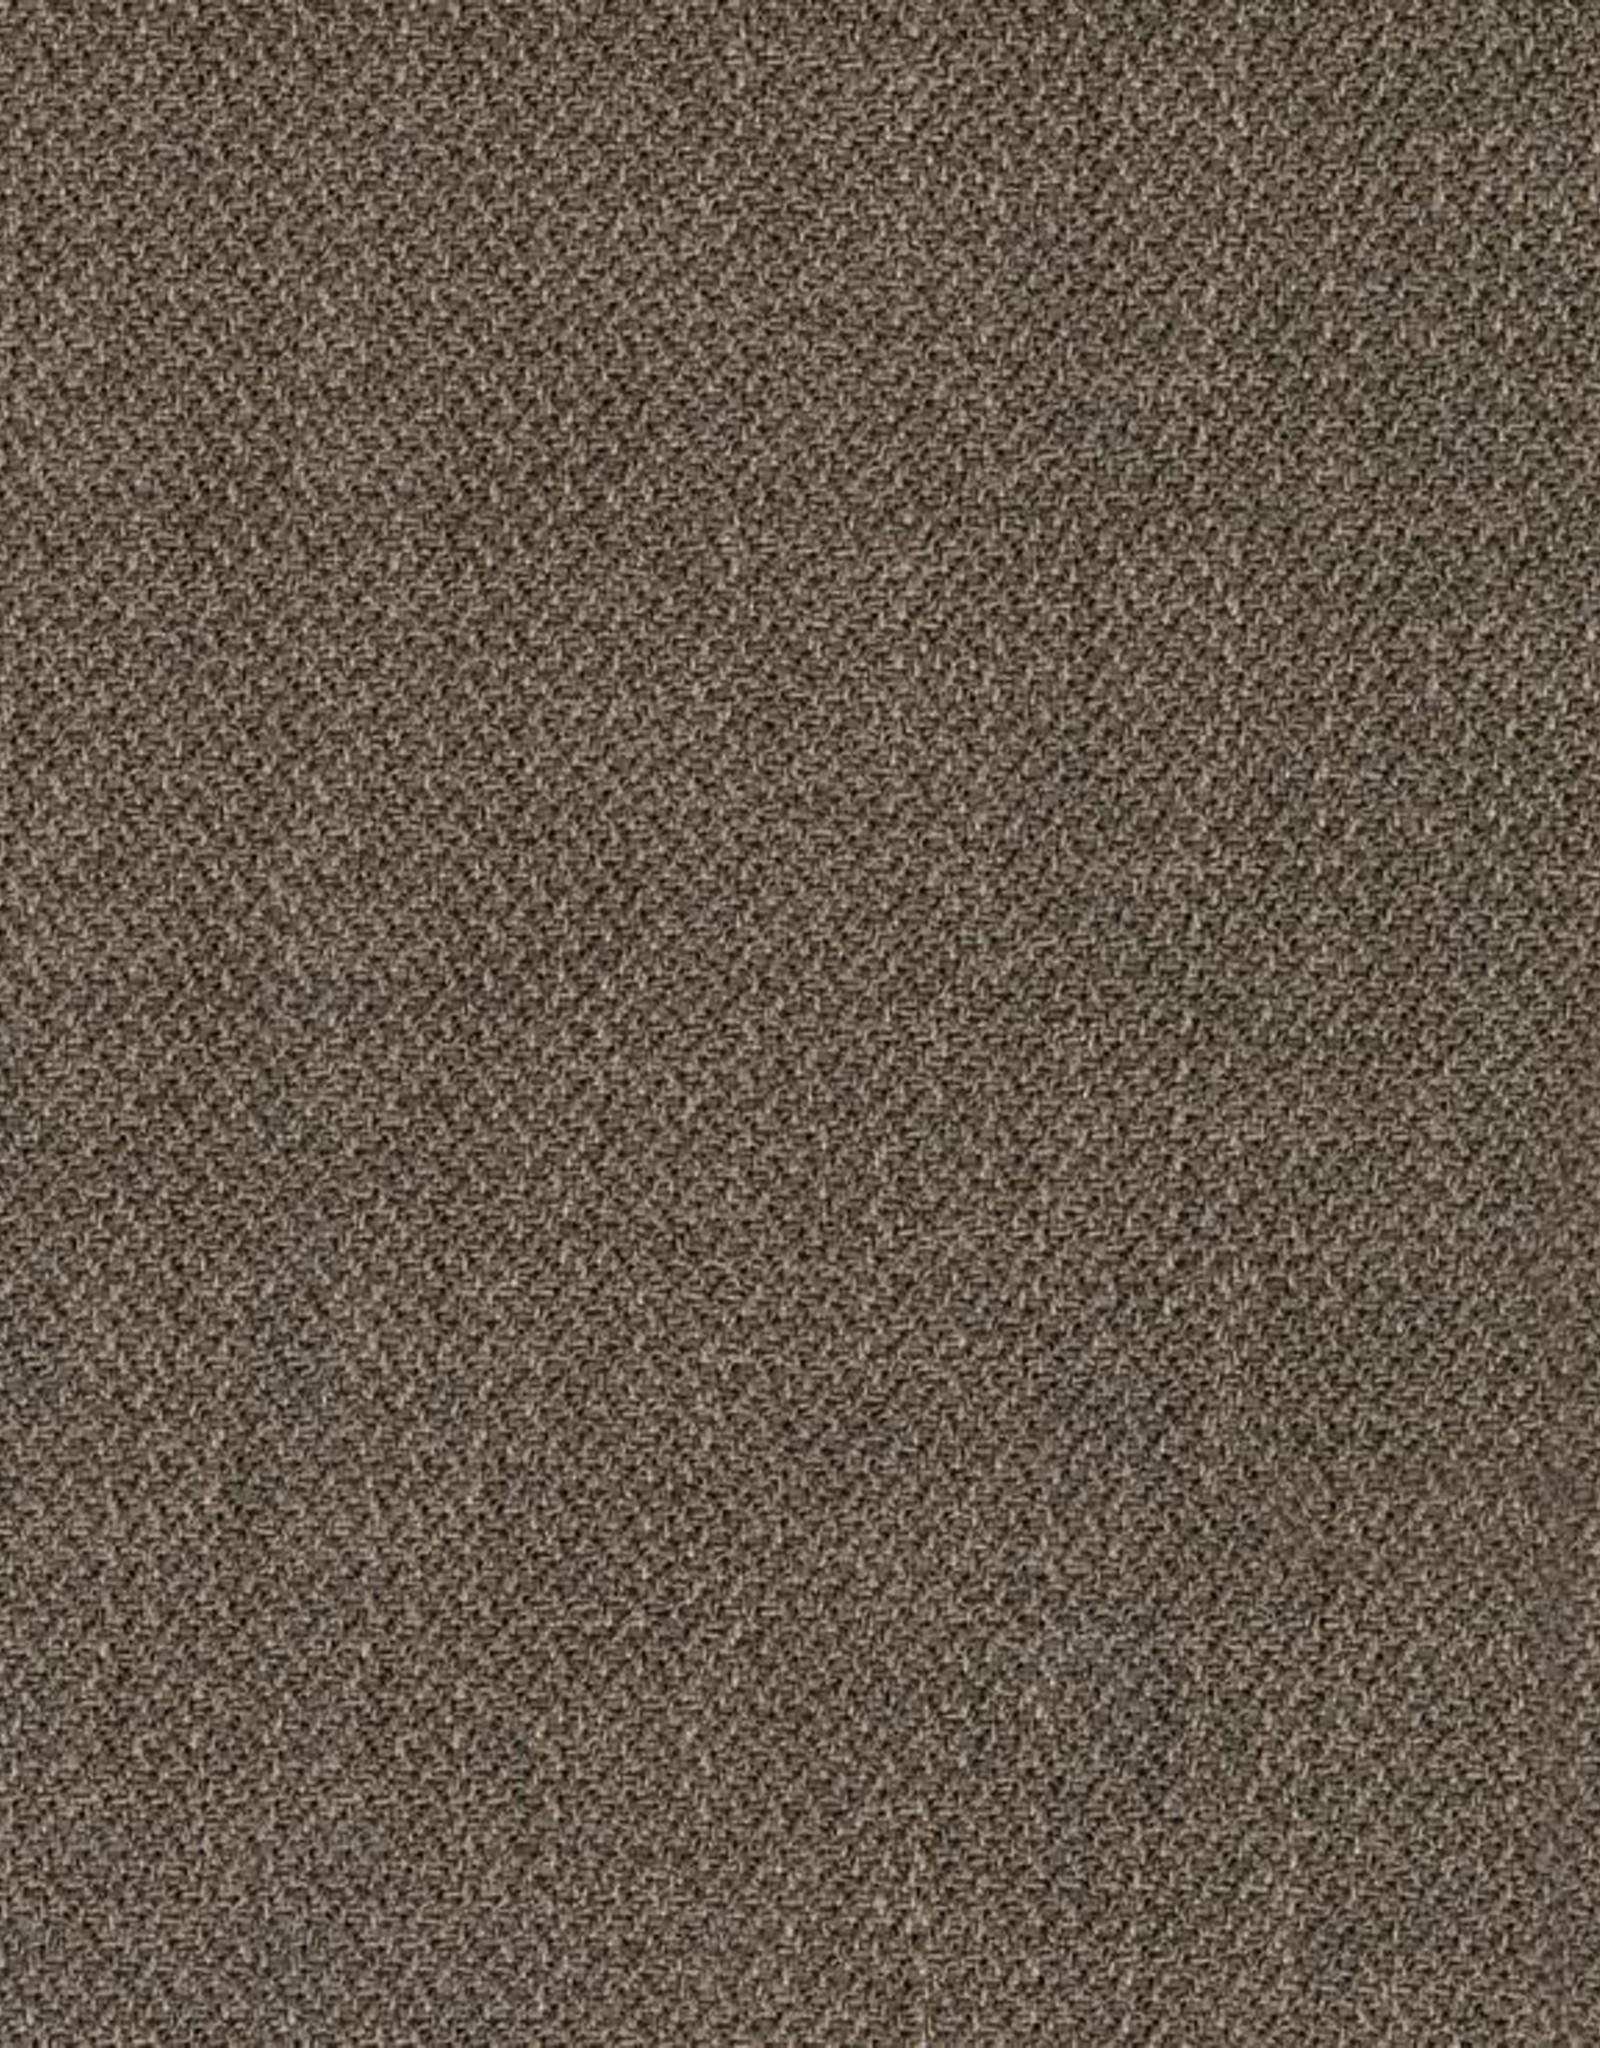 Calicho Ottoman (Cashmere) - Sofa Displayed in Showroom